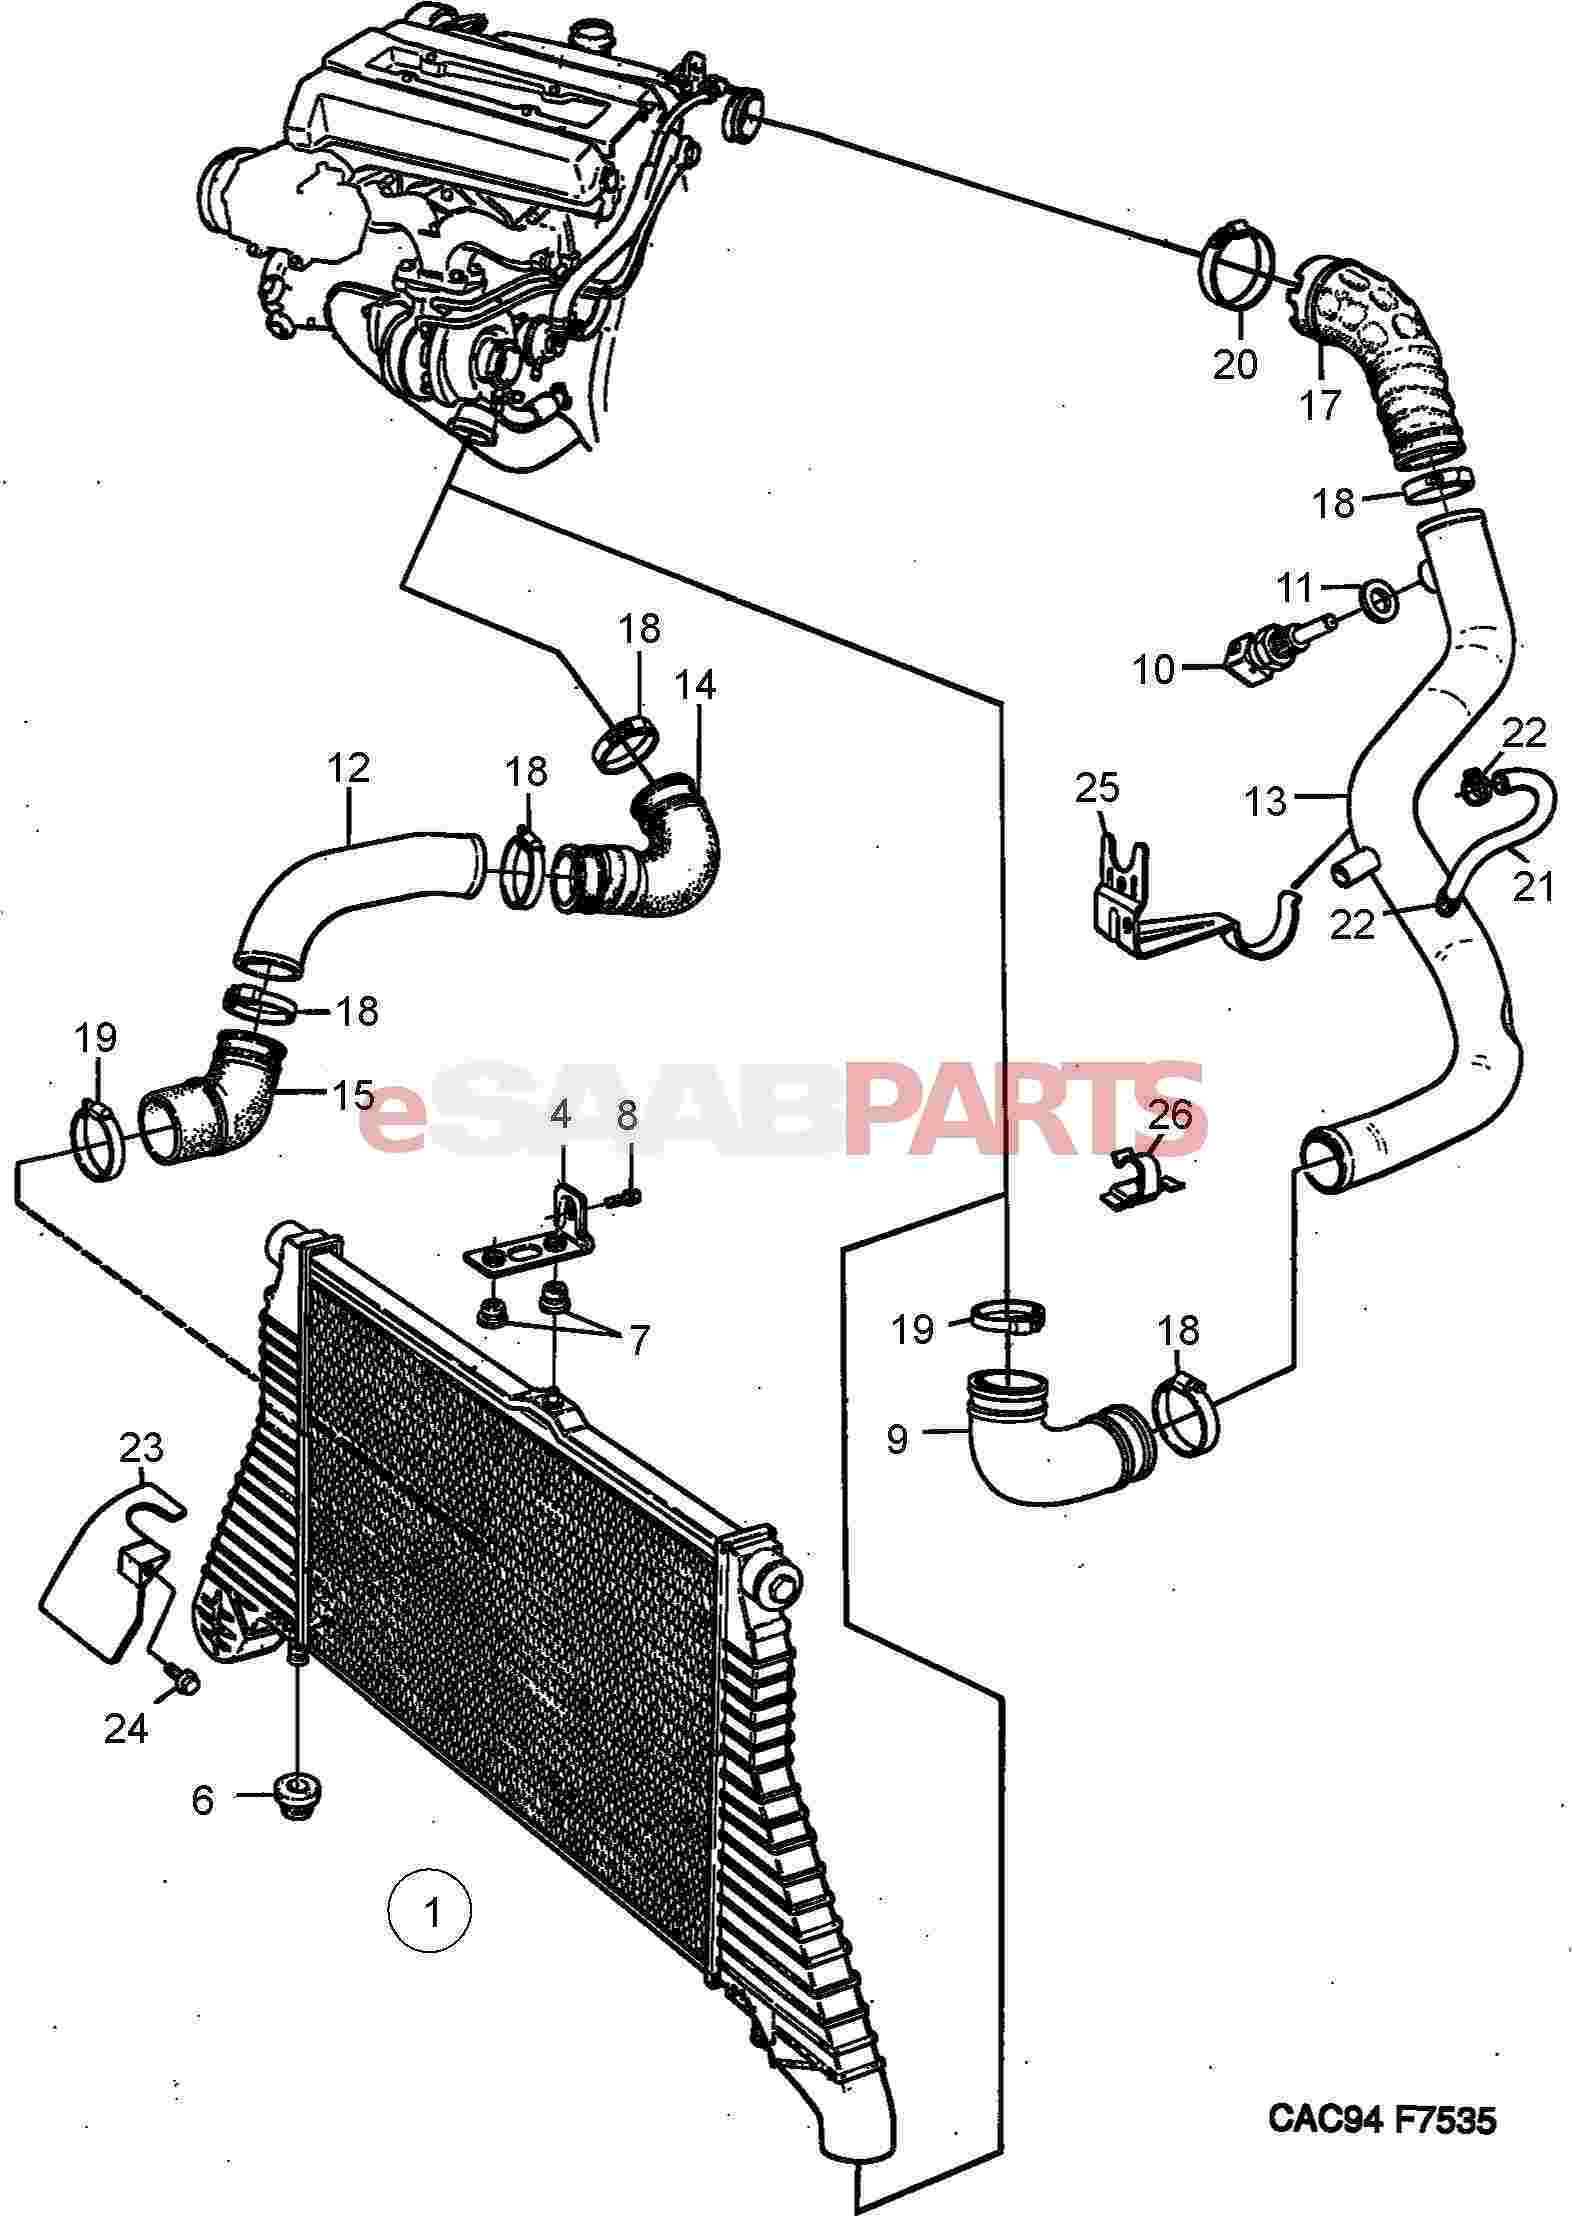 1989 jeep yj 4 2 engine wiring diagram